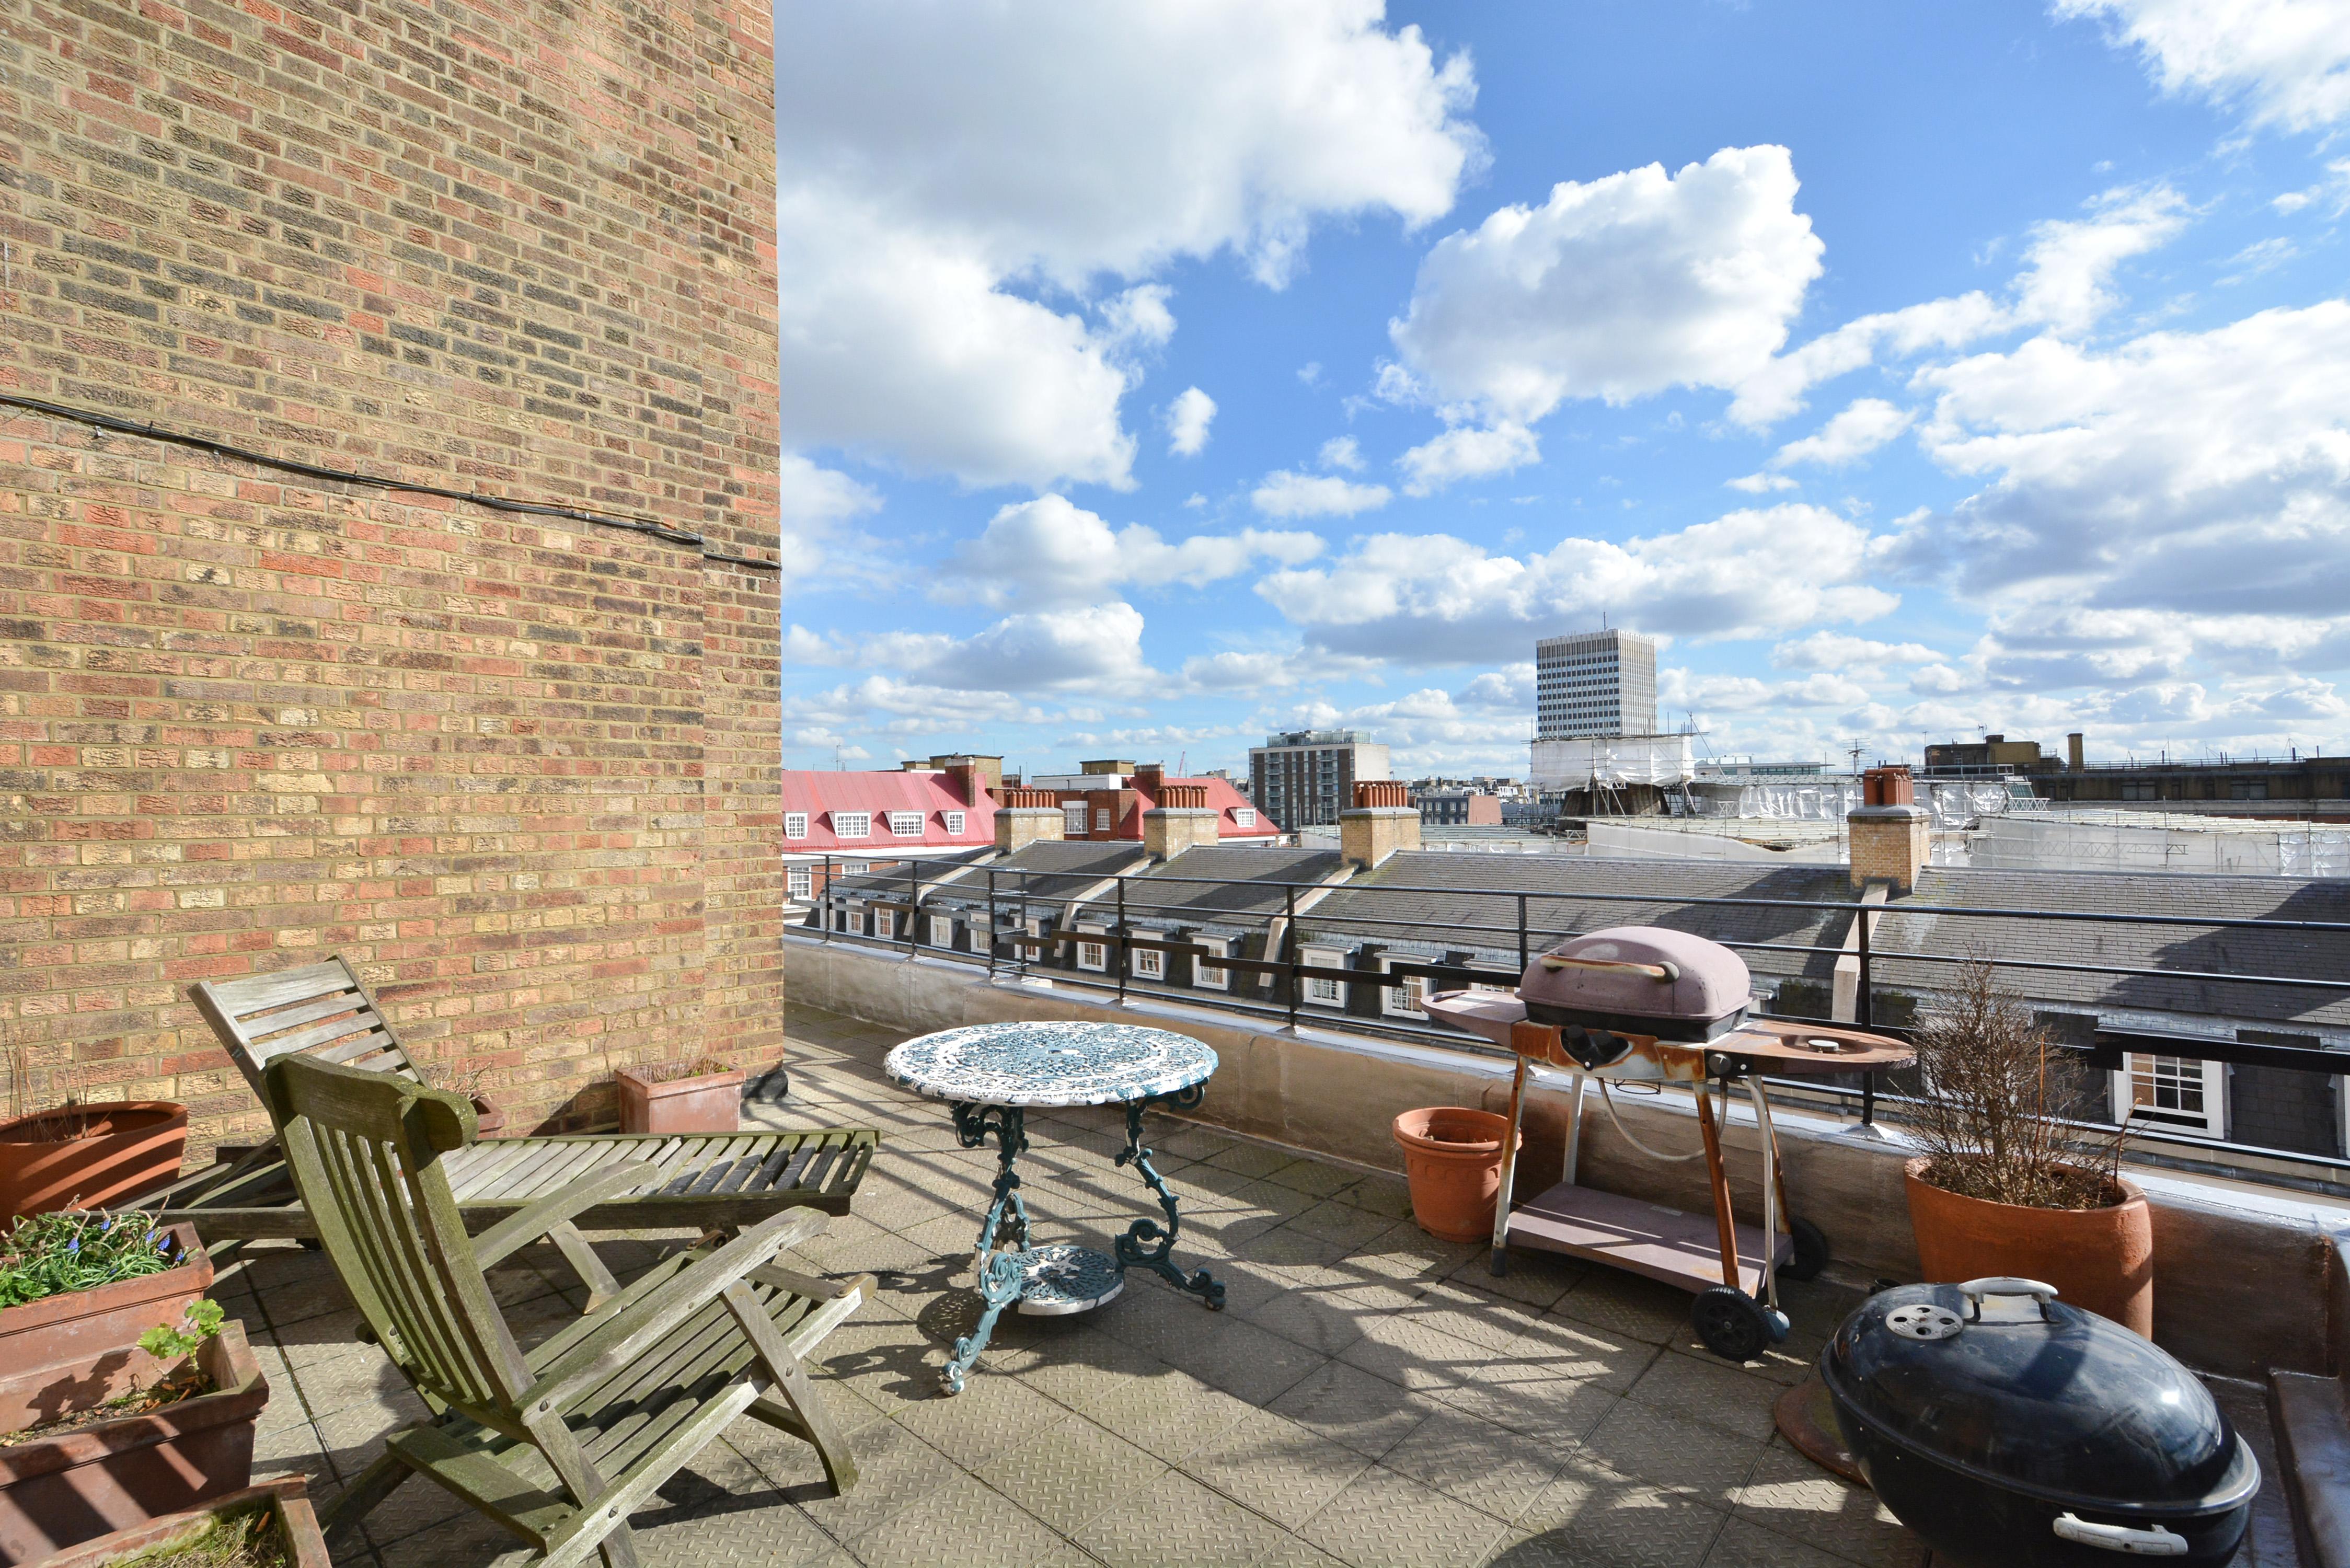 4 Bedroom Flat For Sale In George Street W1h London